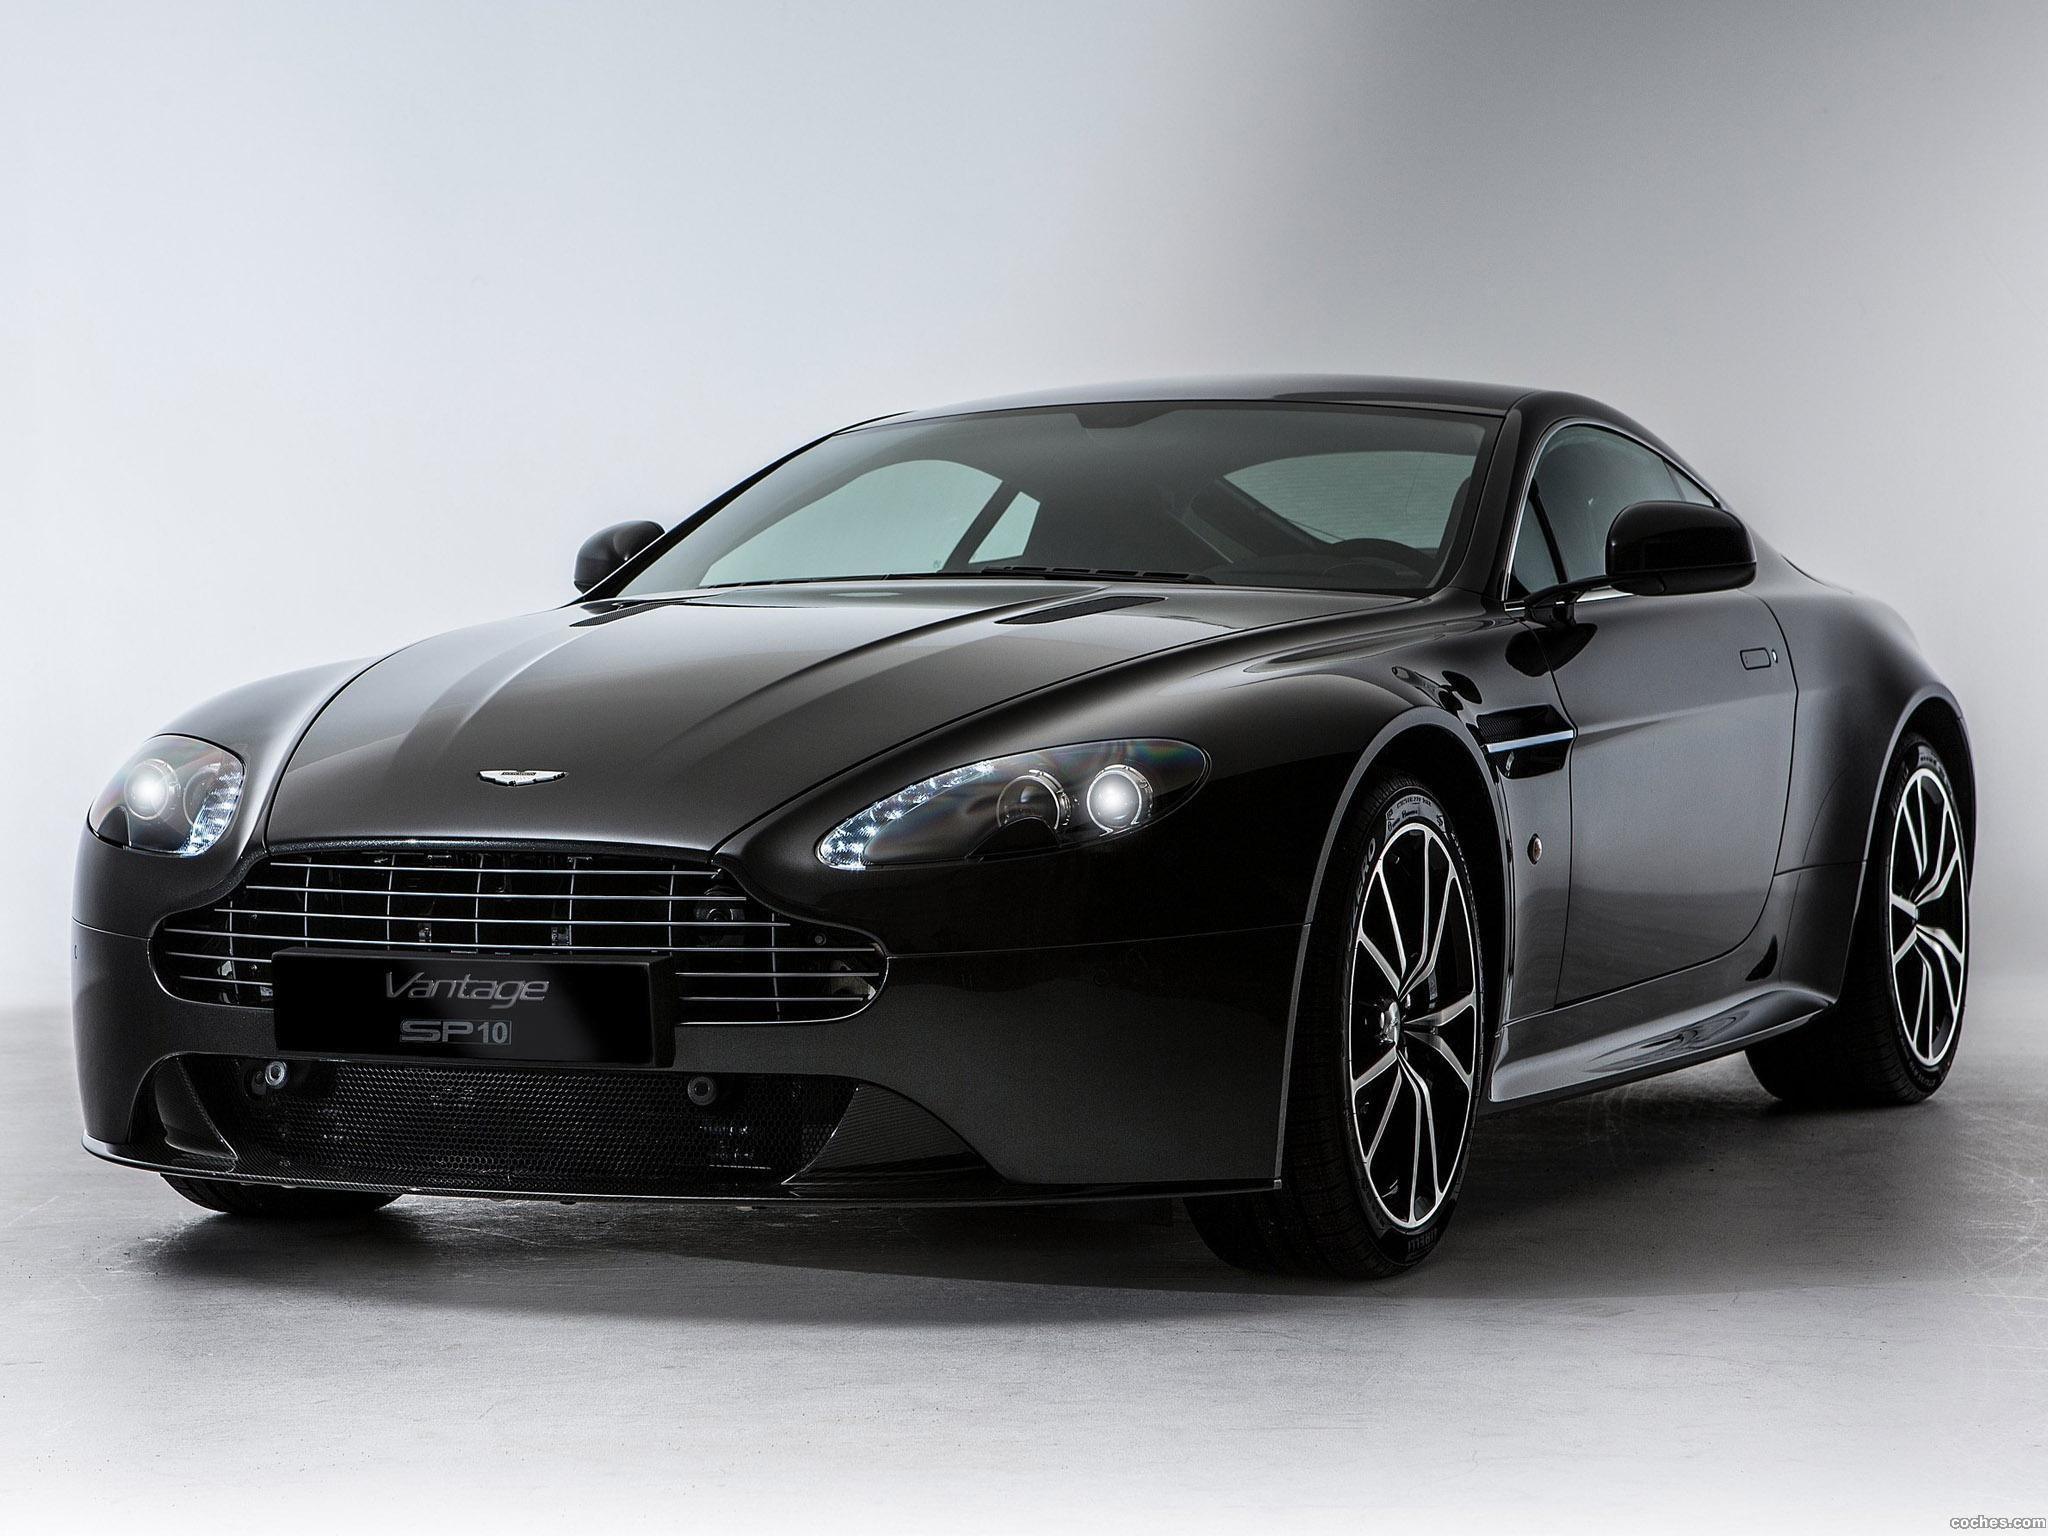 Foto 0 de Aston Martin V8 Vantage SP10 2013